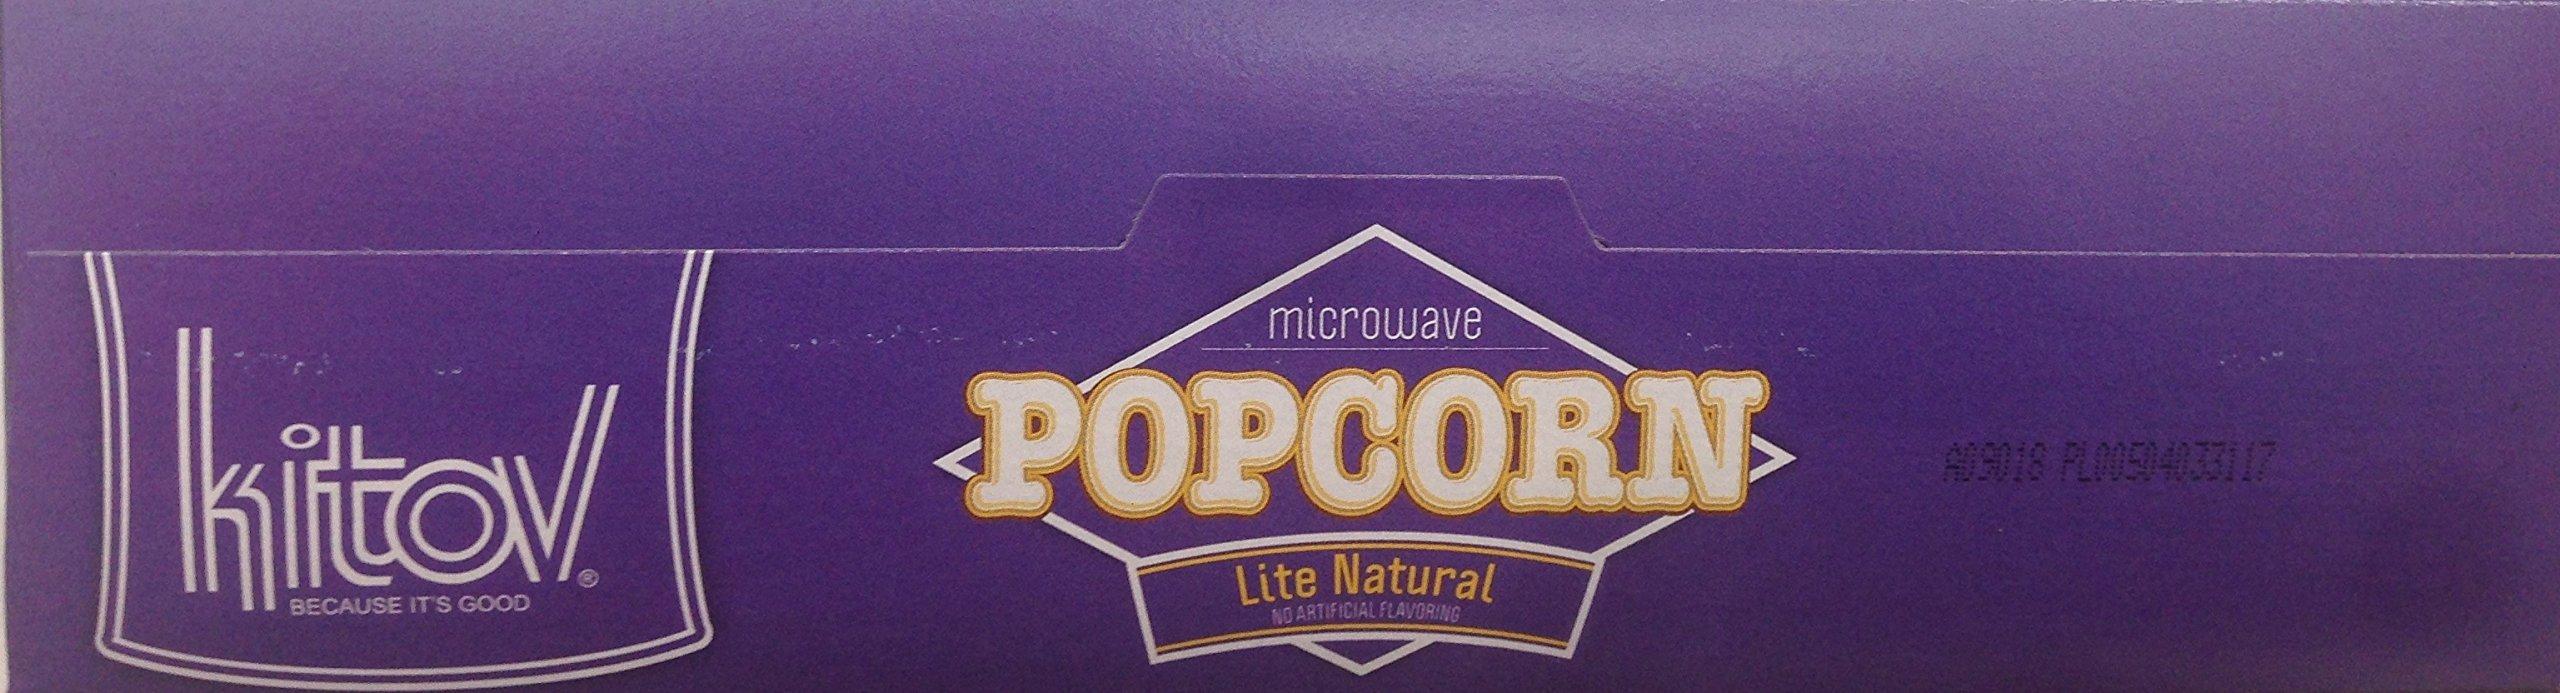 Kitov Microwave Popcorn Lite Natural No Cholesterol 19.2 Oz. Pk Of 6.